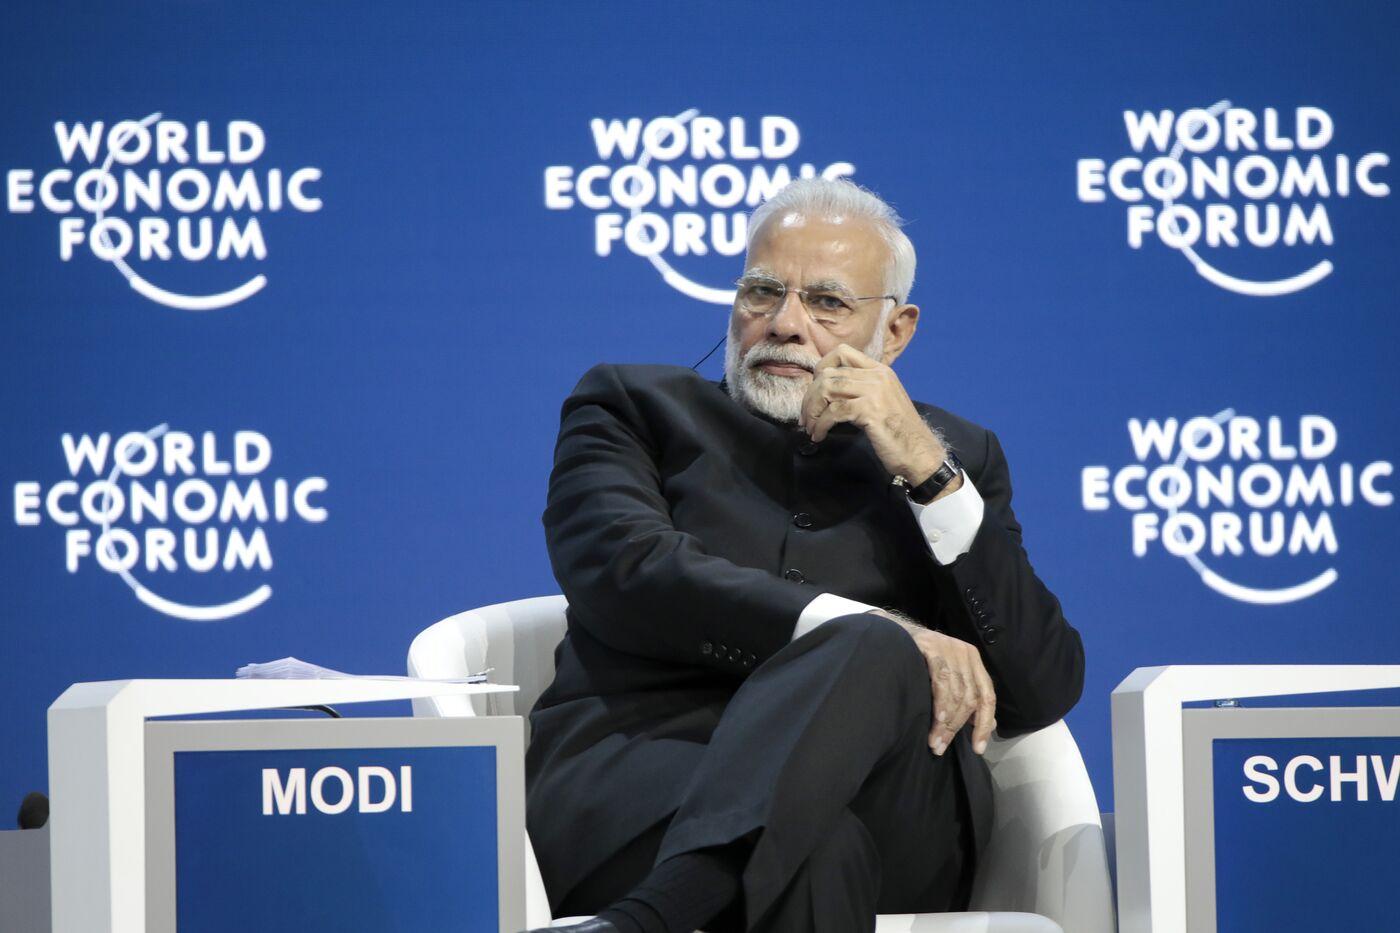 India Set Sights on $5 Trillion Economy by 2025, Modi Says